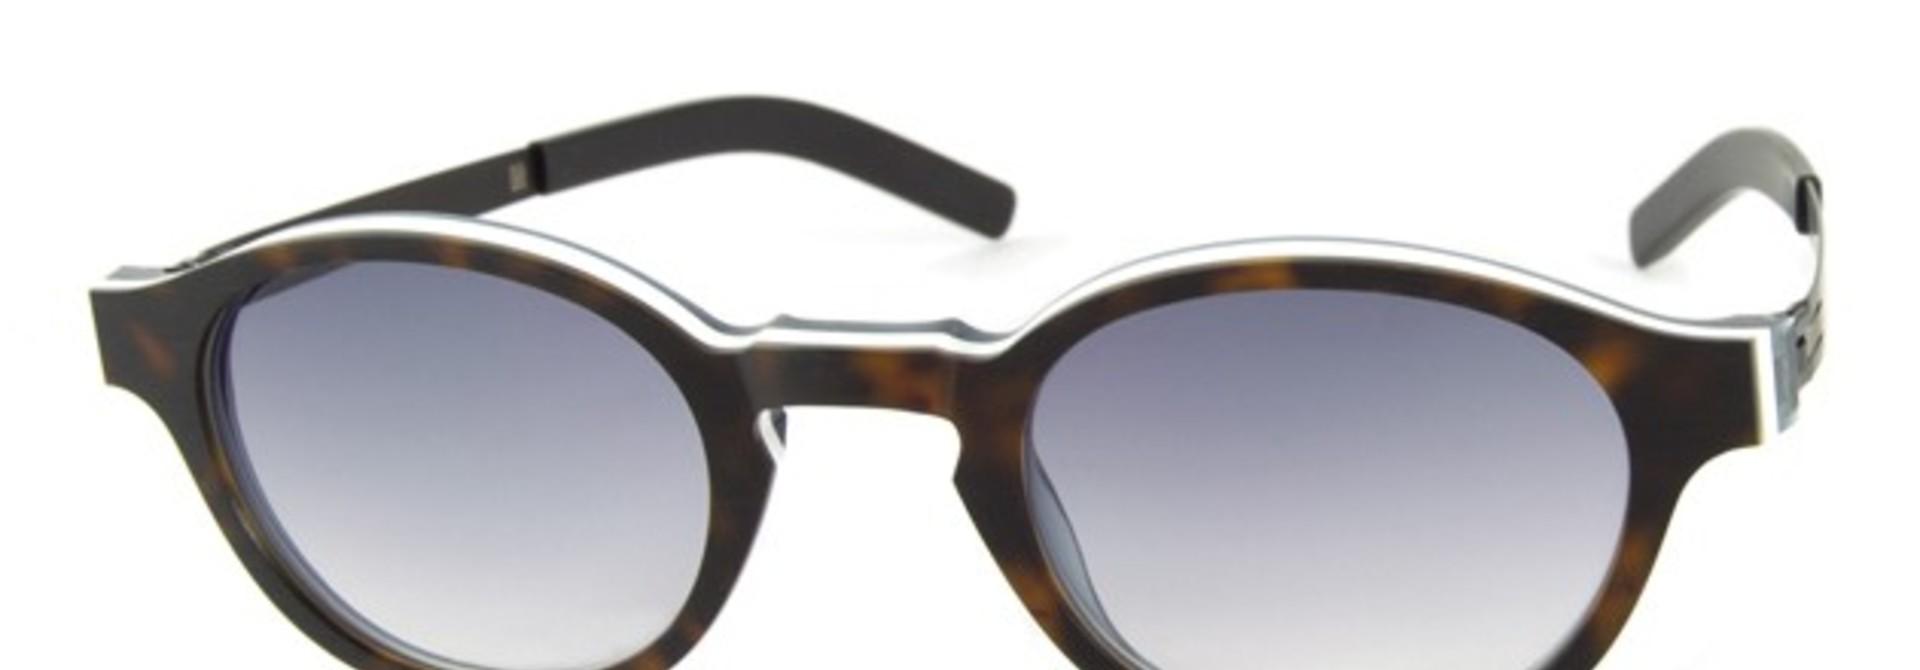 ic! berlin Nameless 6 Sunglasses